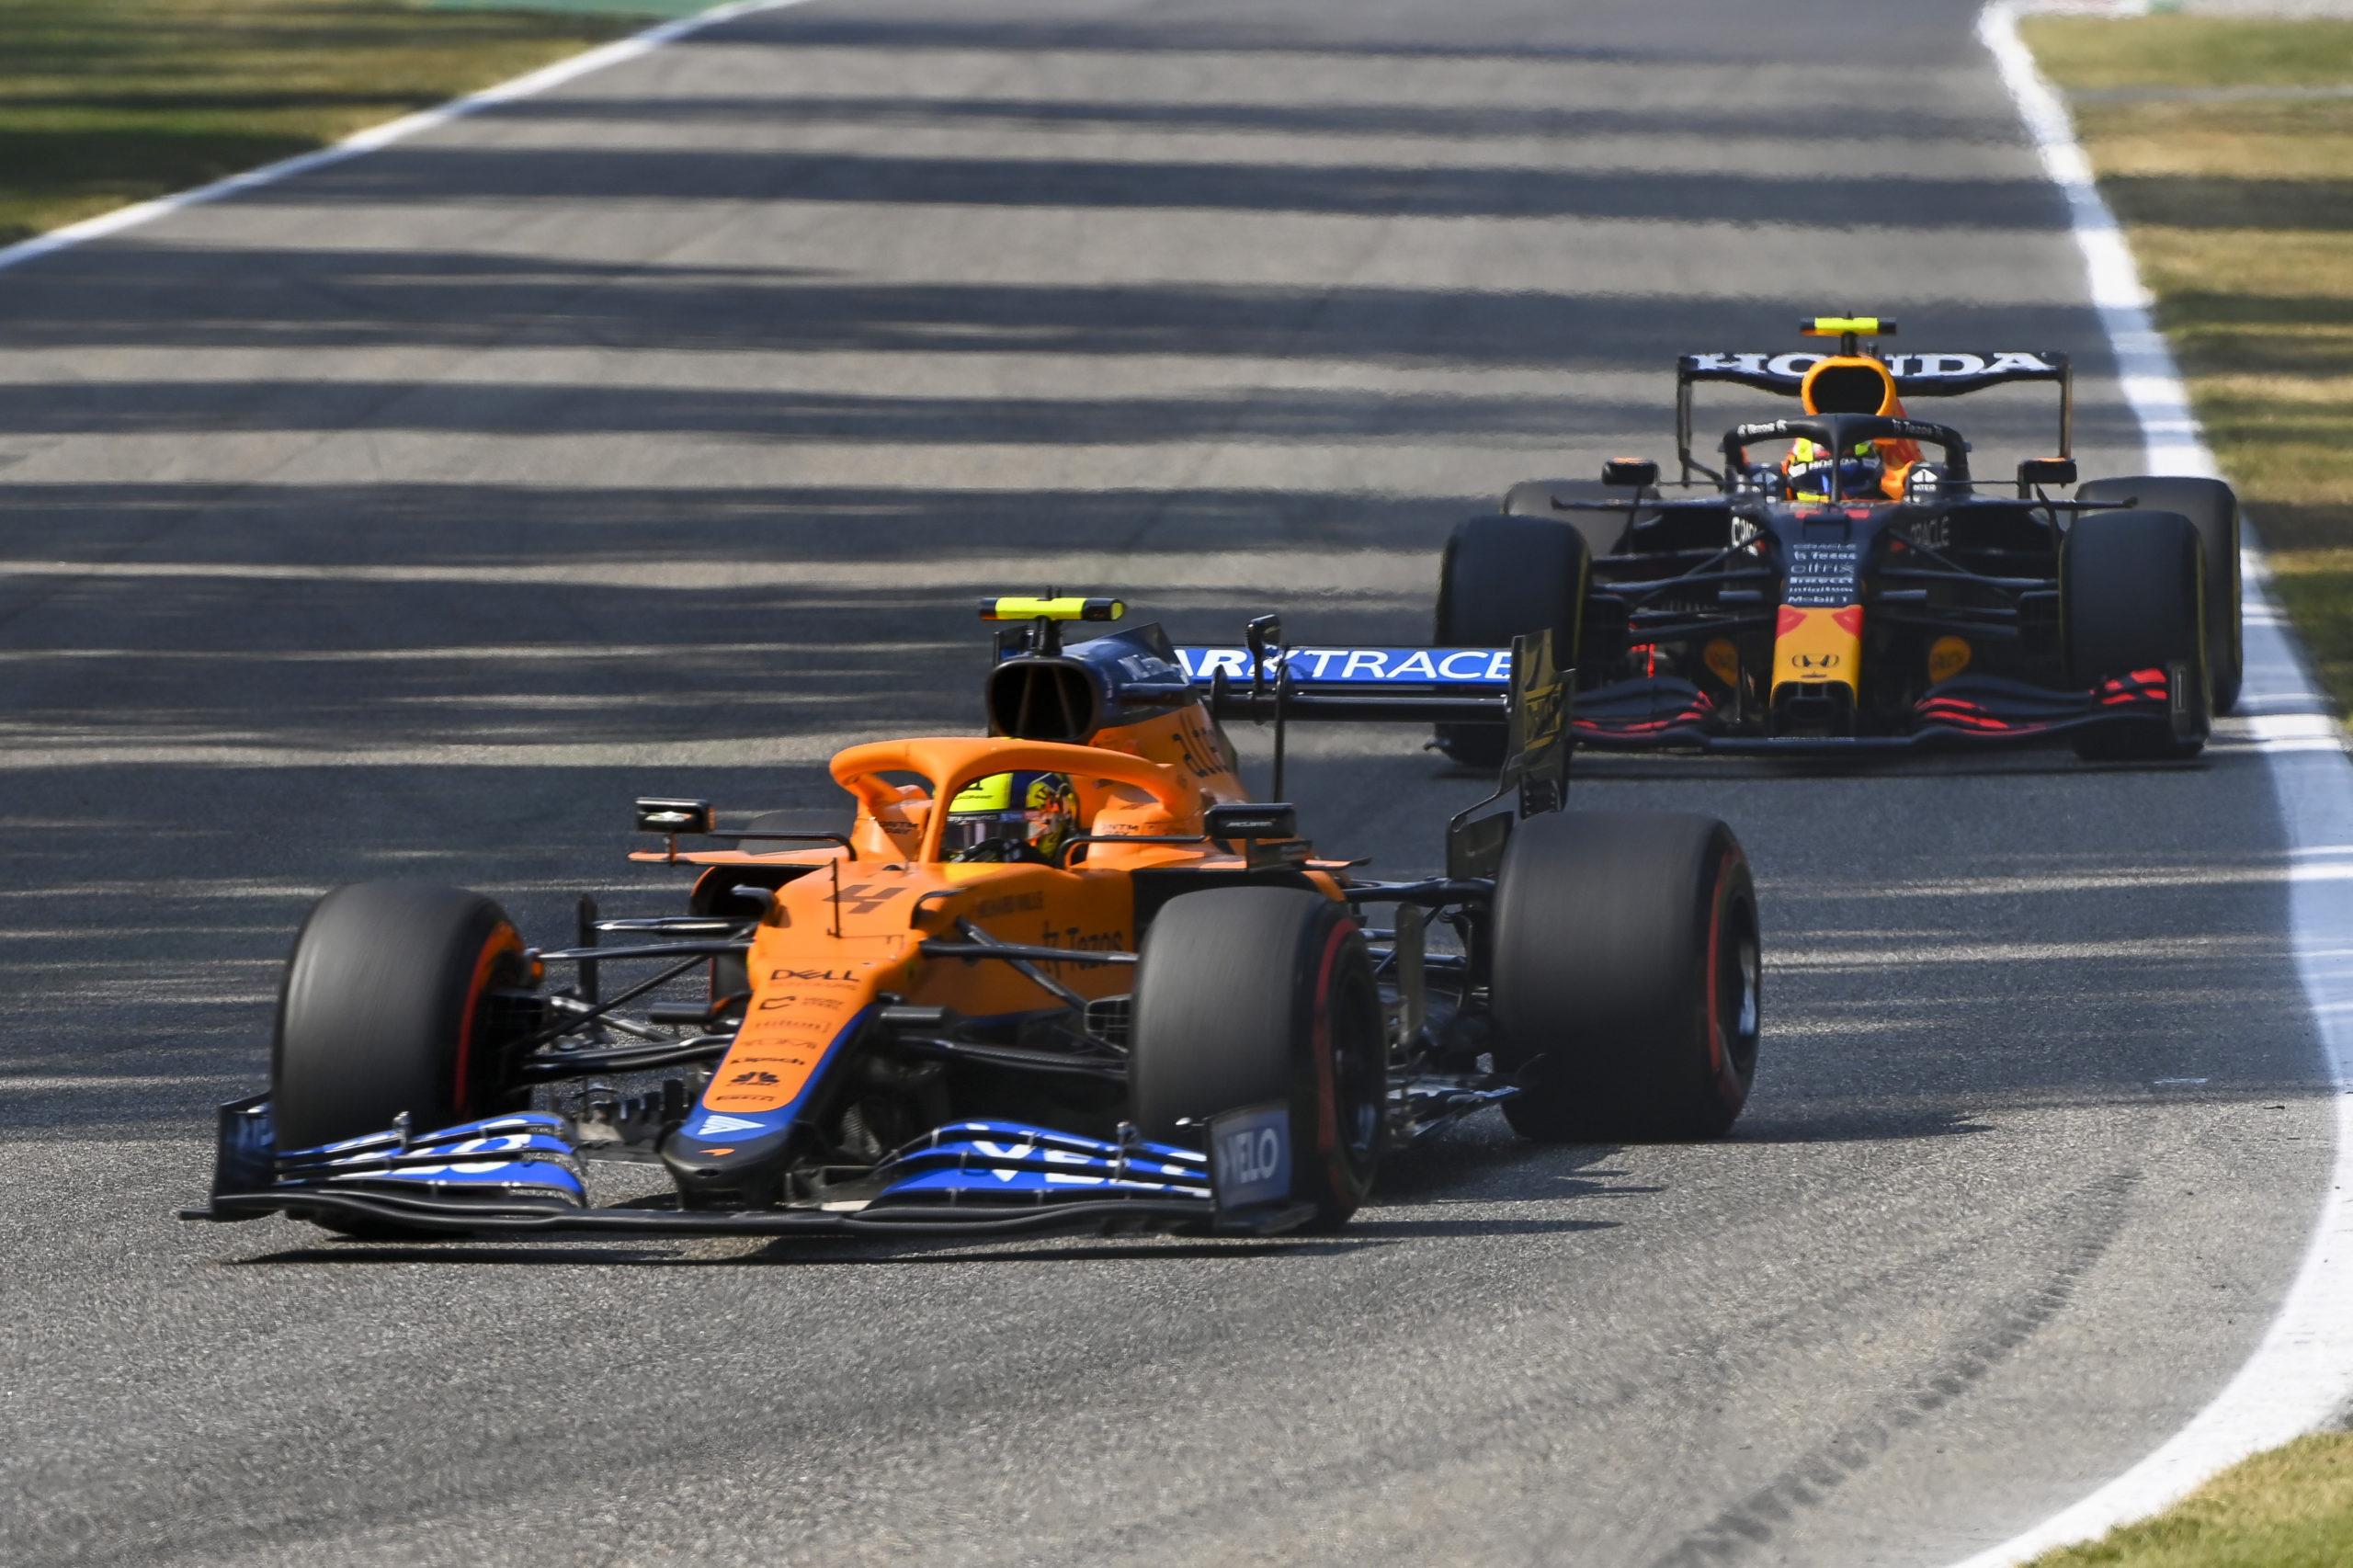 Lando Norris, McLaren MCL35M, leads Sergio Perez, Red Bull Racing RB16B entering a corner